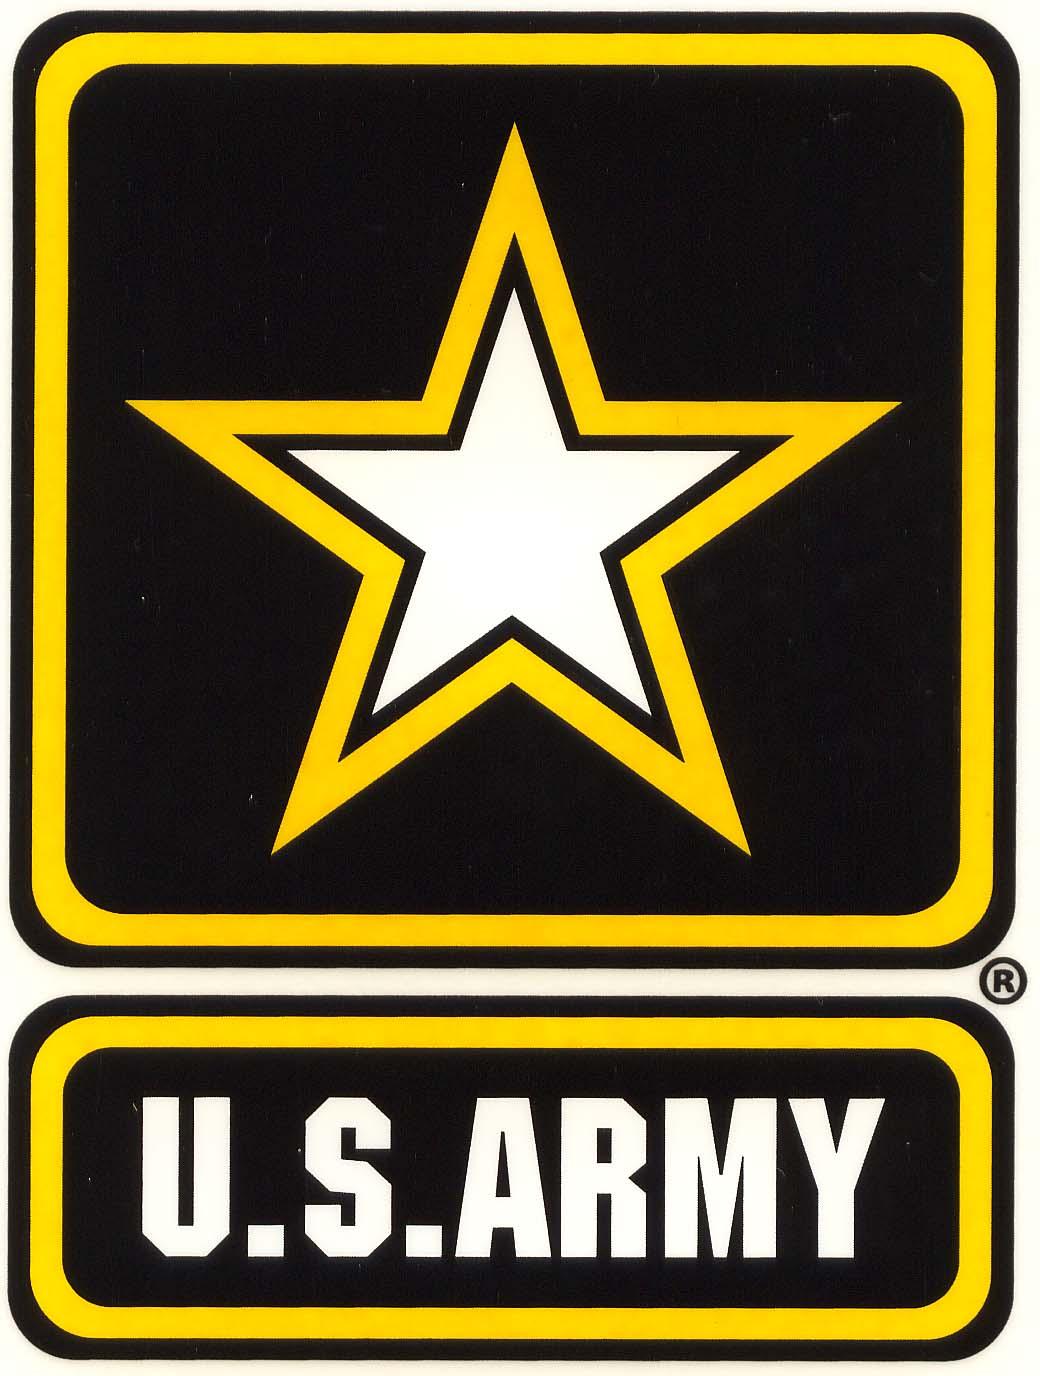 military clip art army - photo #3